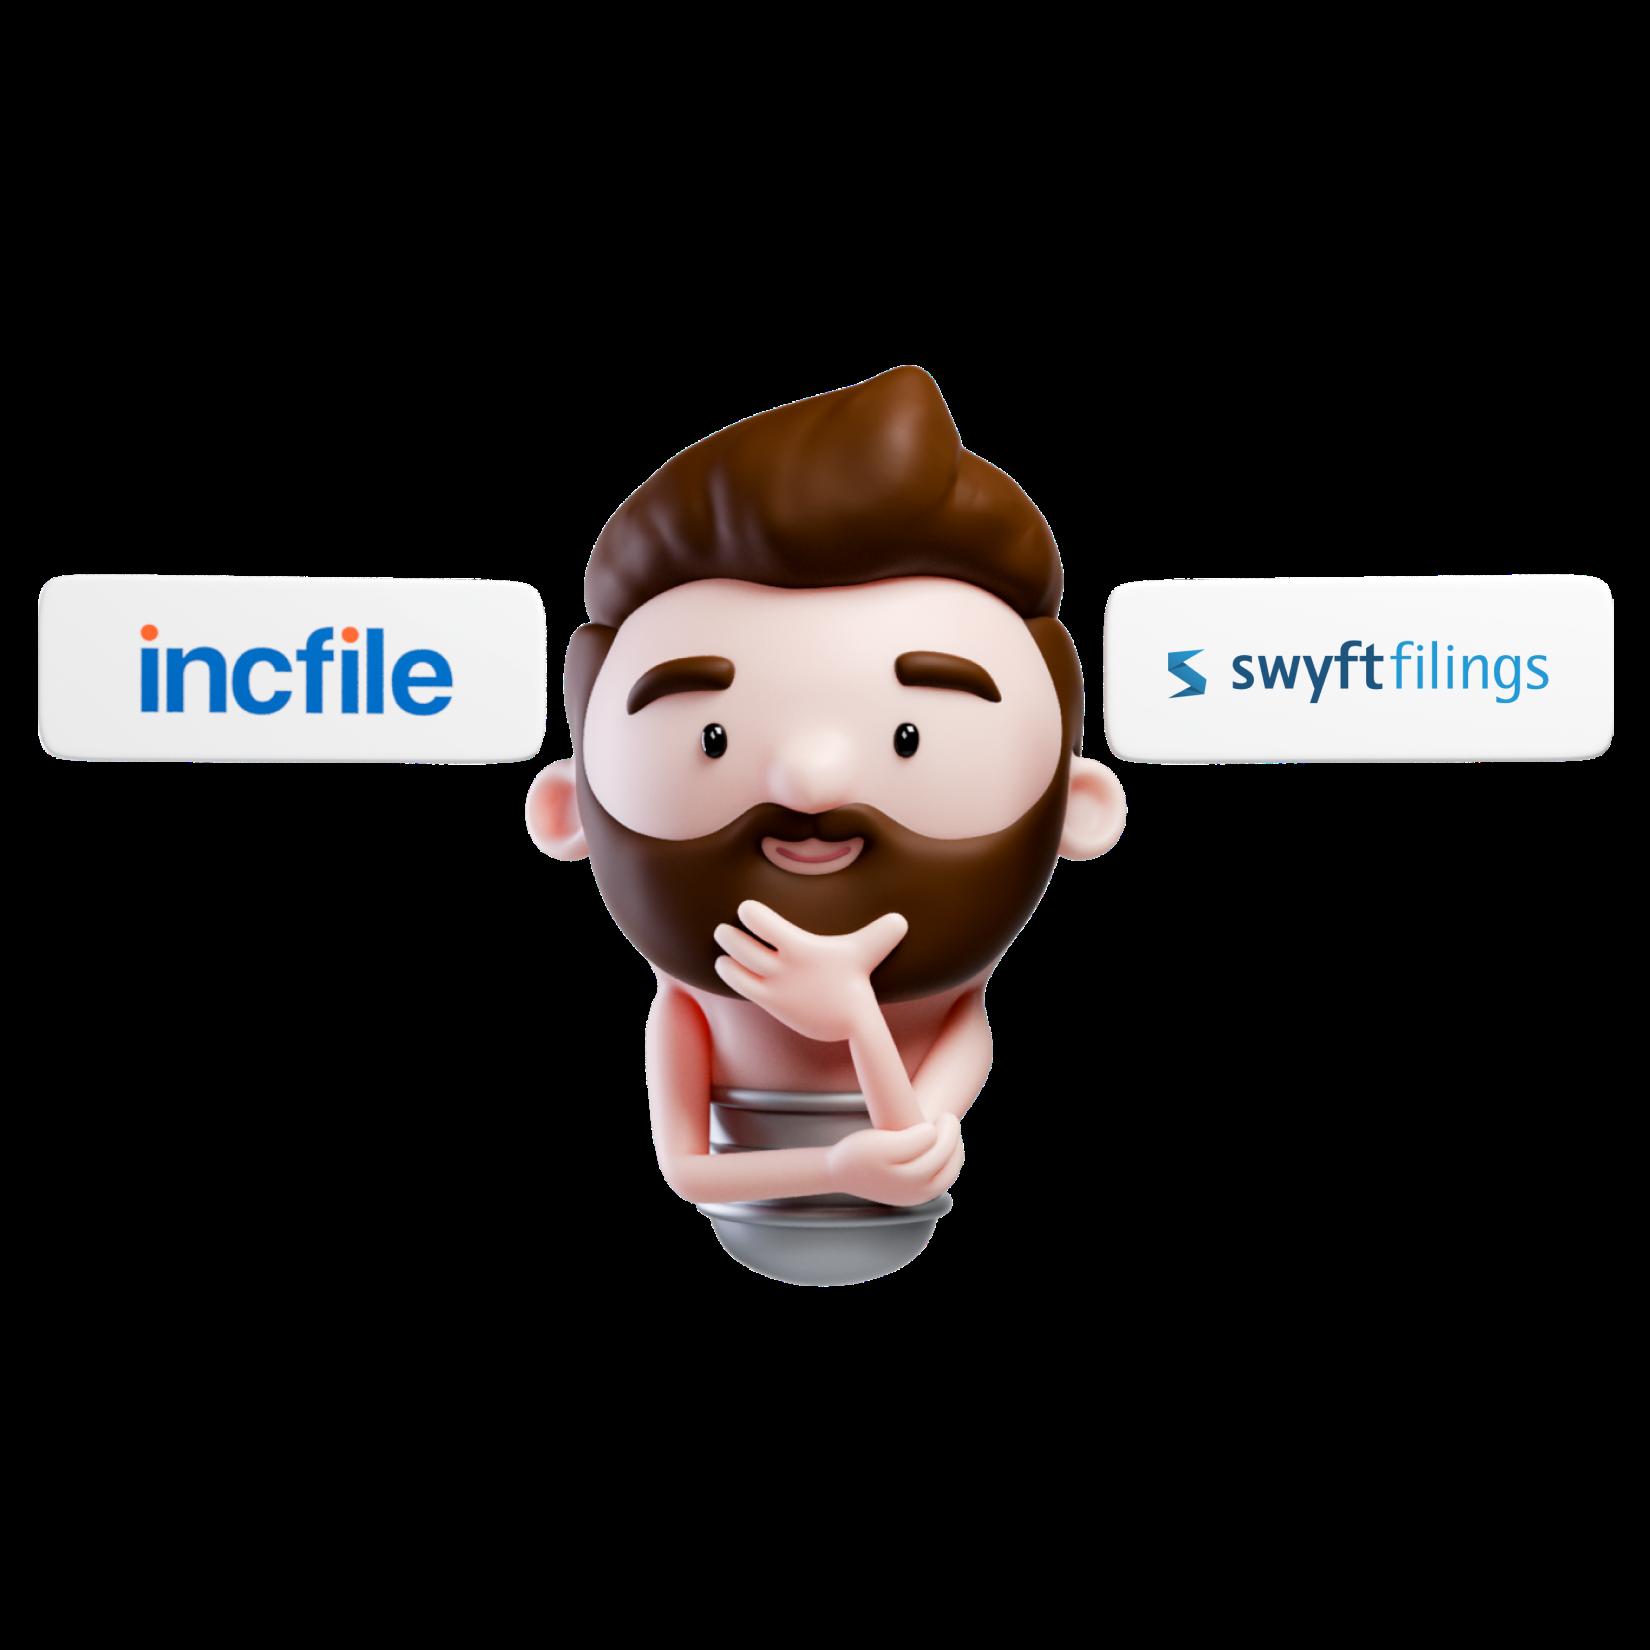 incfile-vs-swyftfilings-top